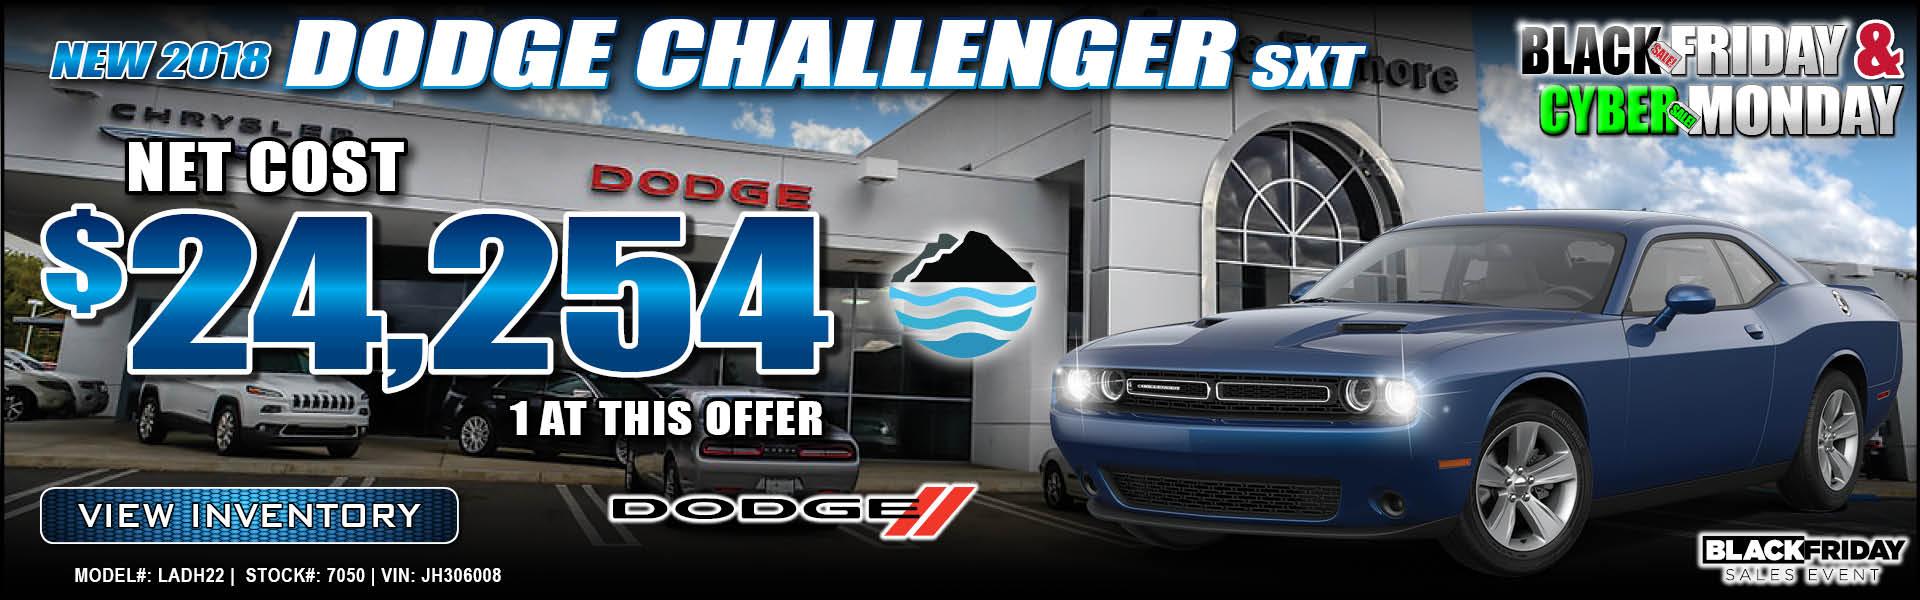 Dodge Challenger $24,254